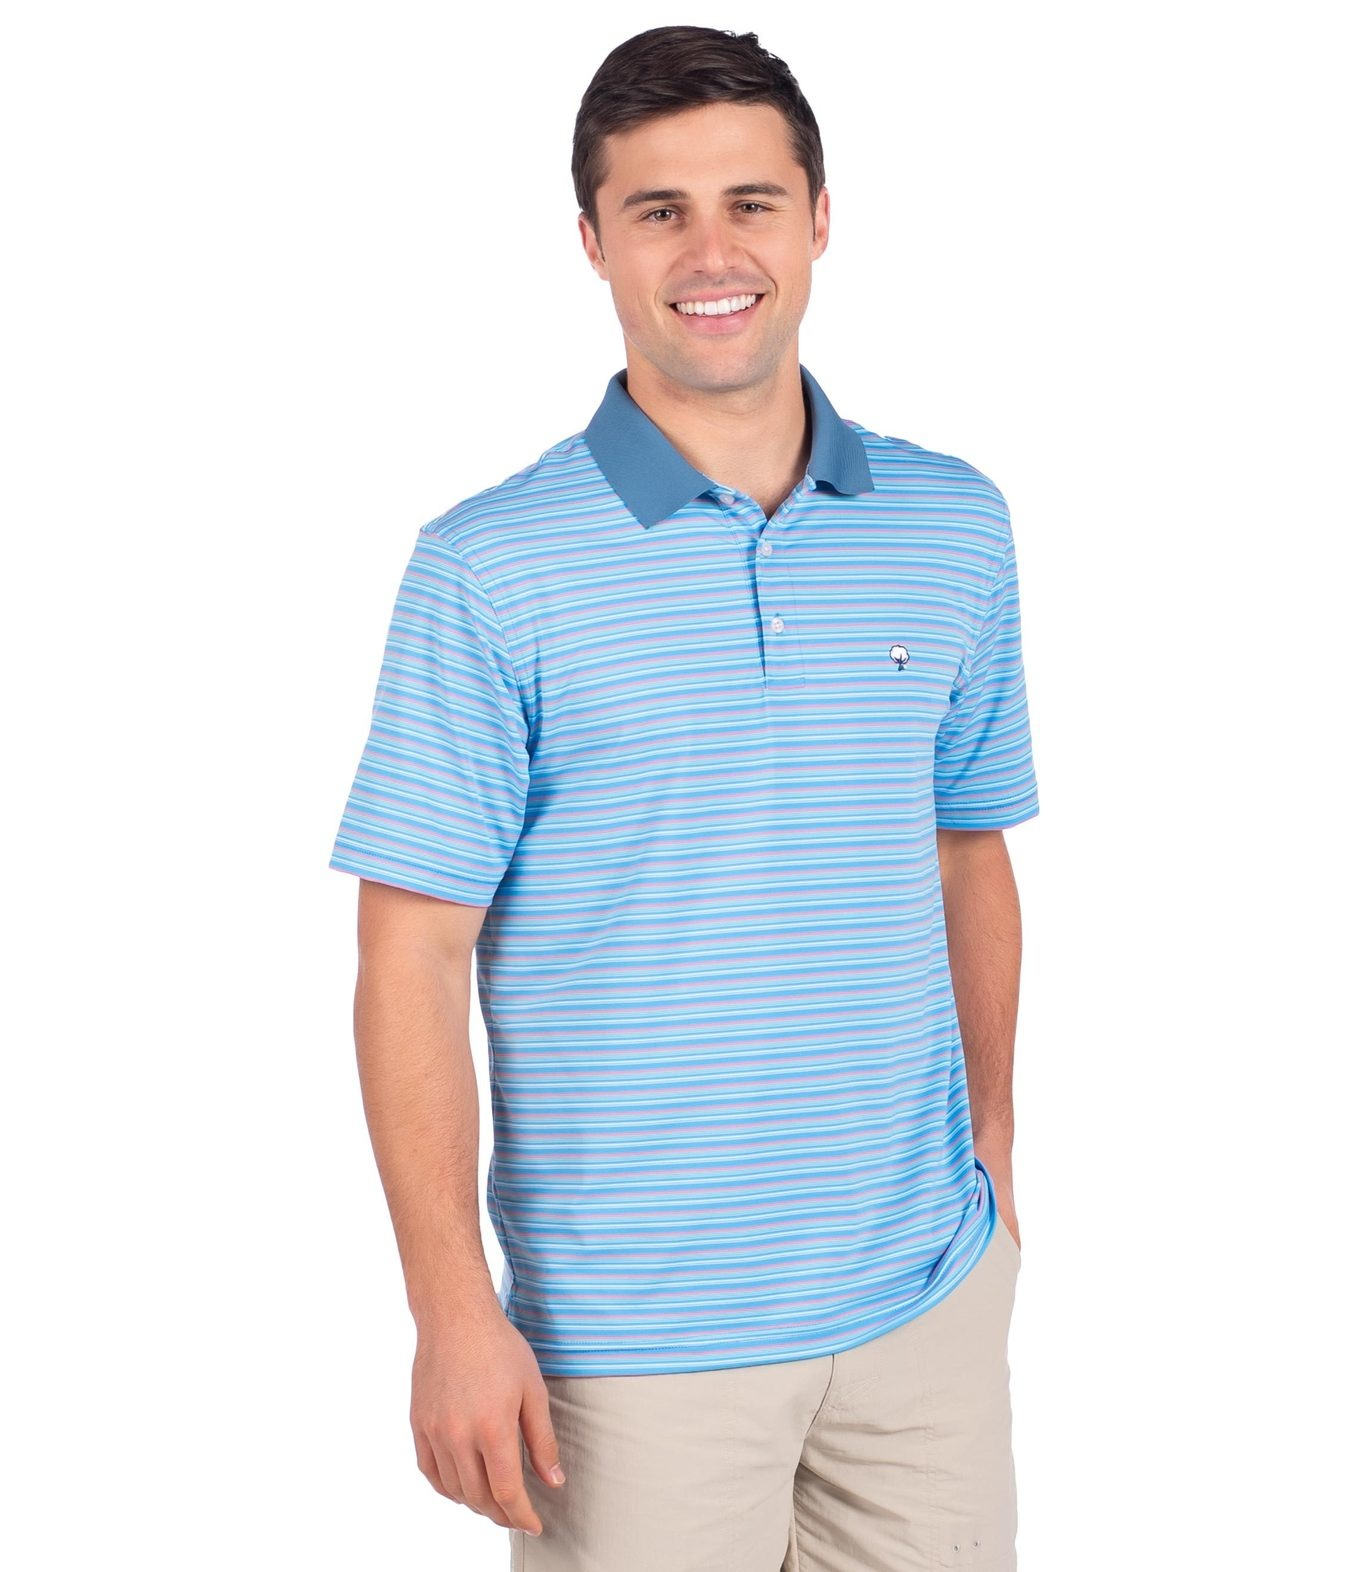 Southern Shirt Brunswick Stripe Polo